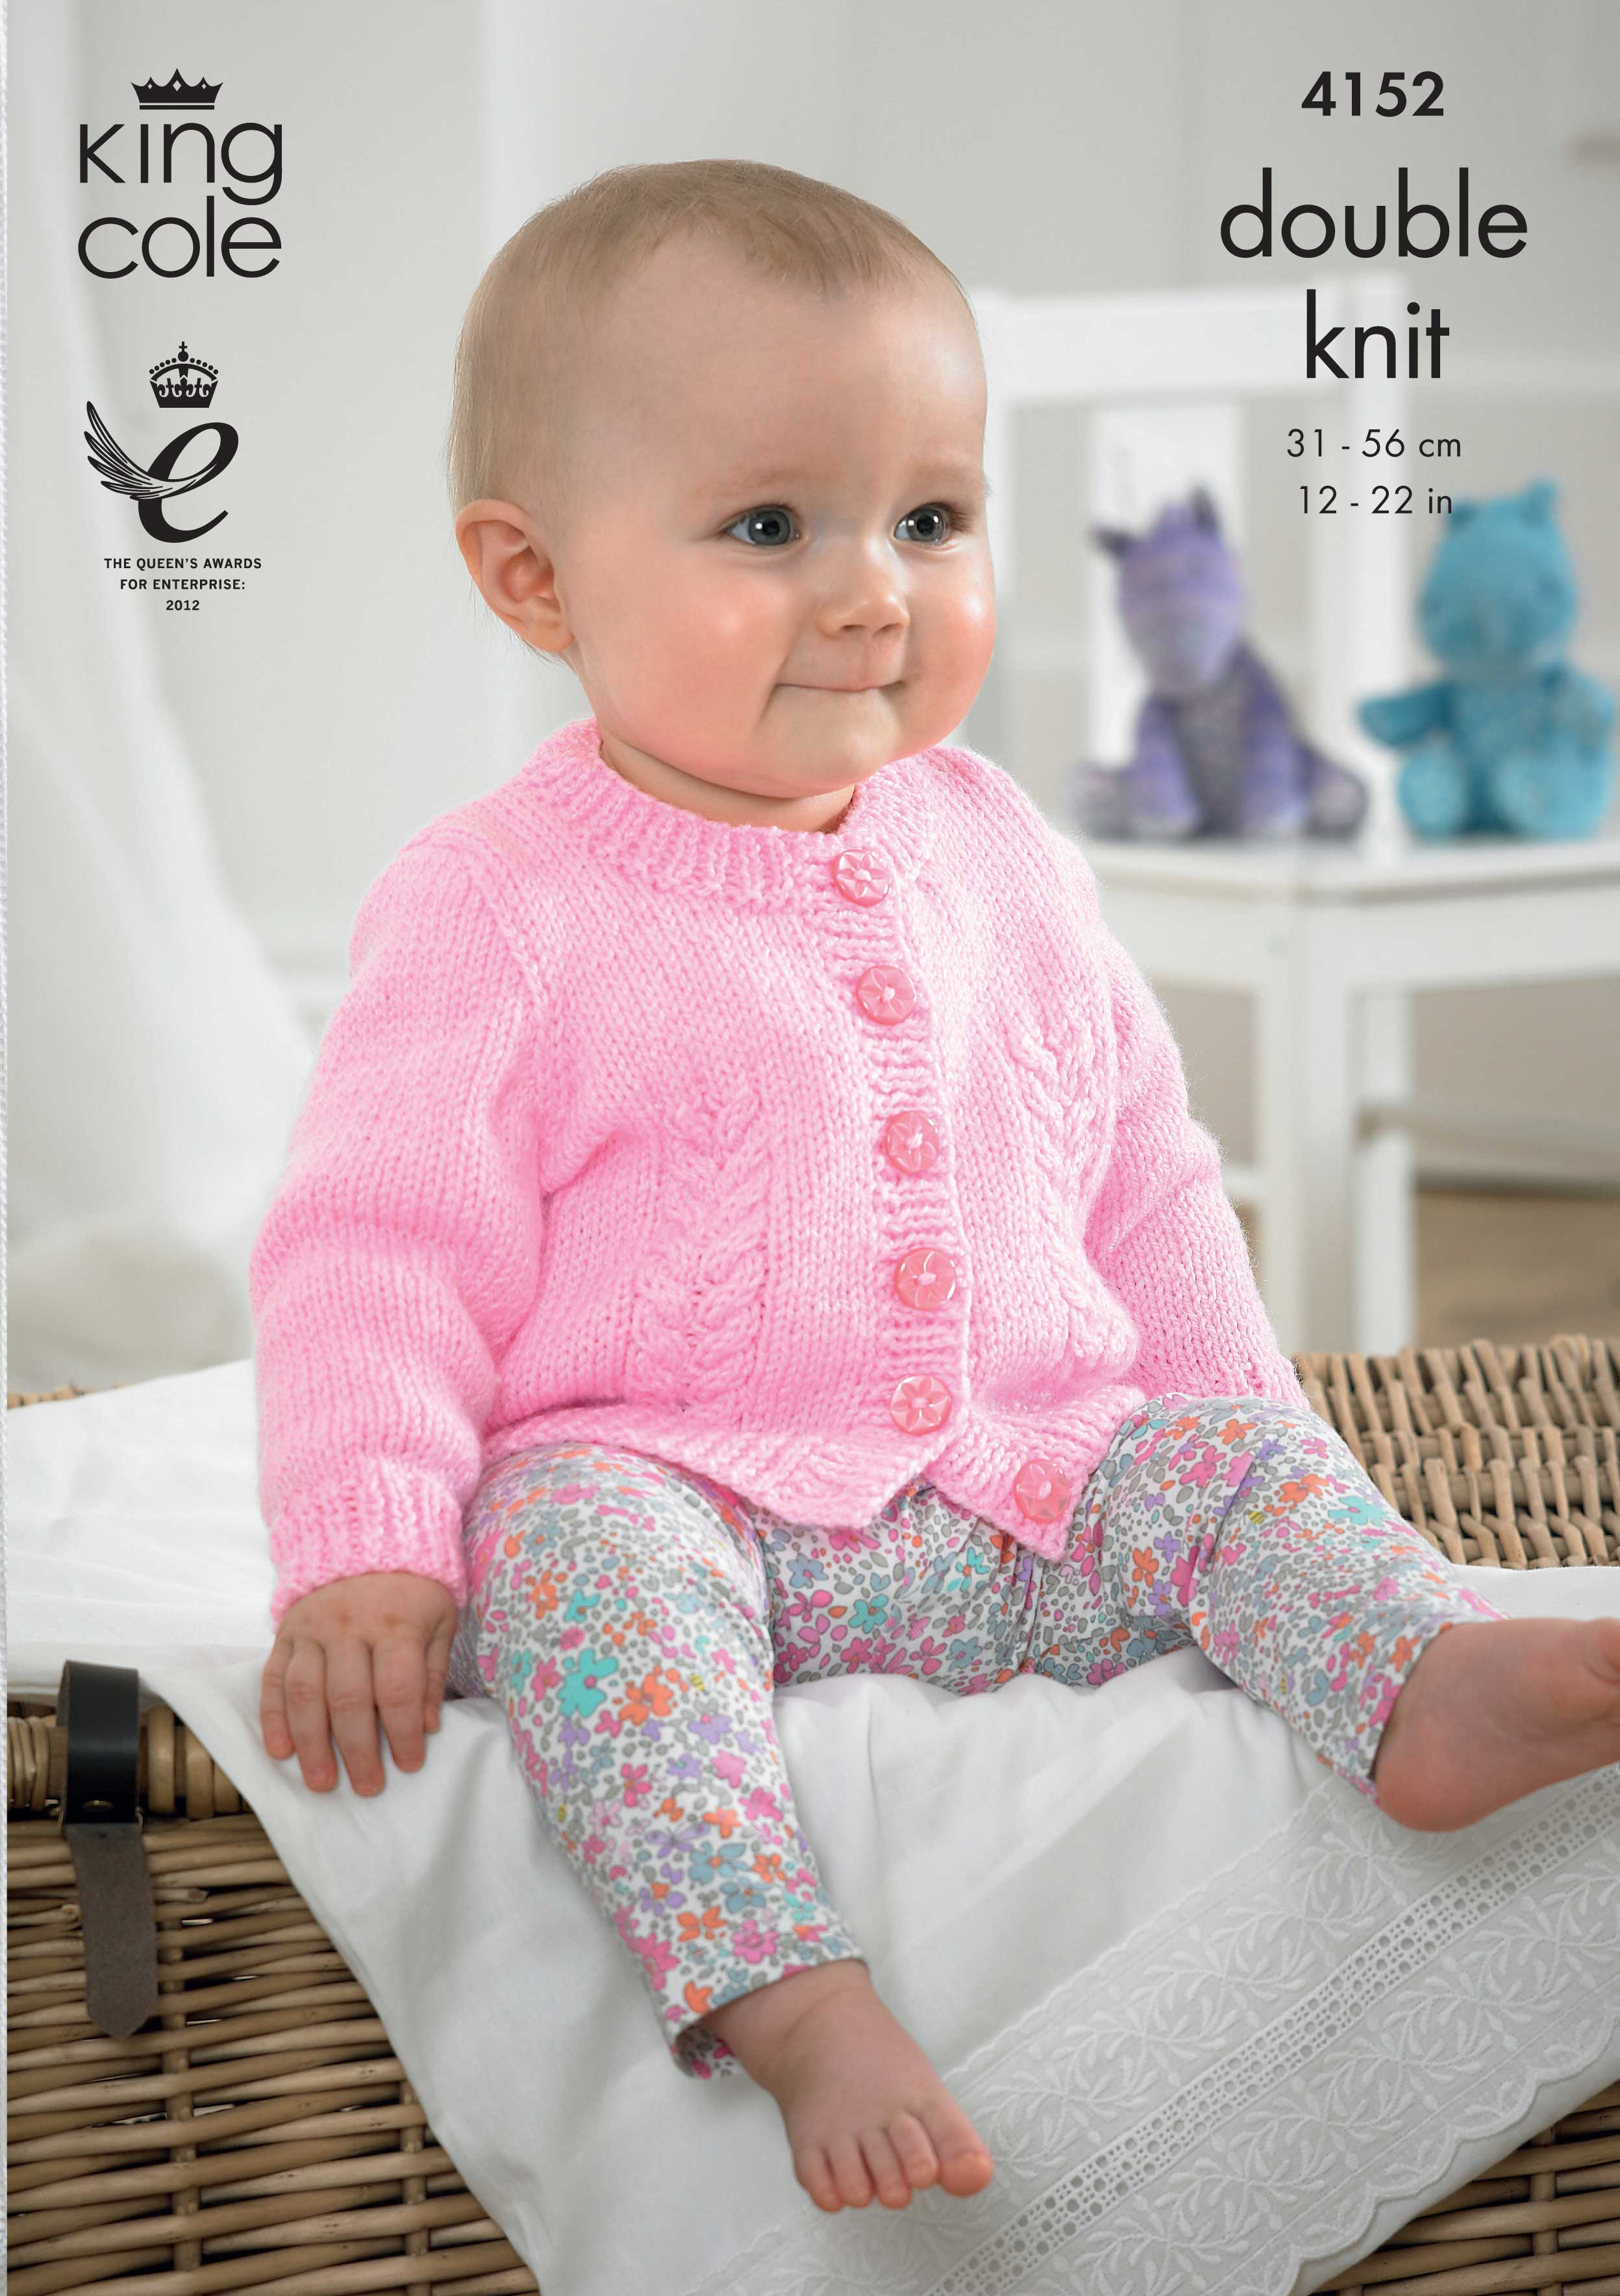 DK Baby Cardigan Knitting Pattern 4152 - King Cole